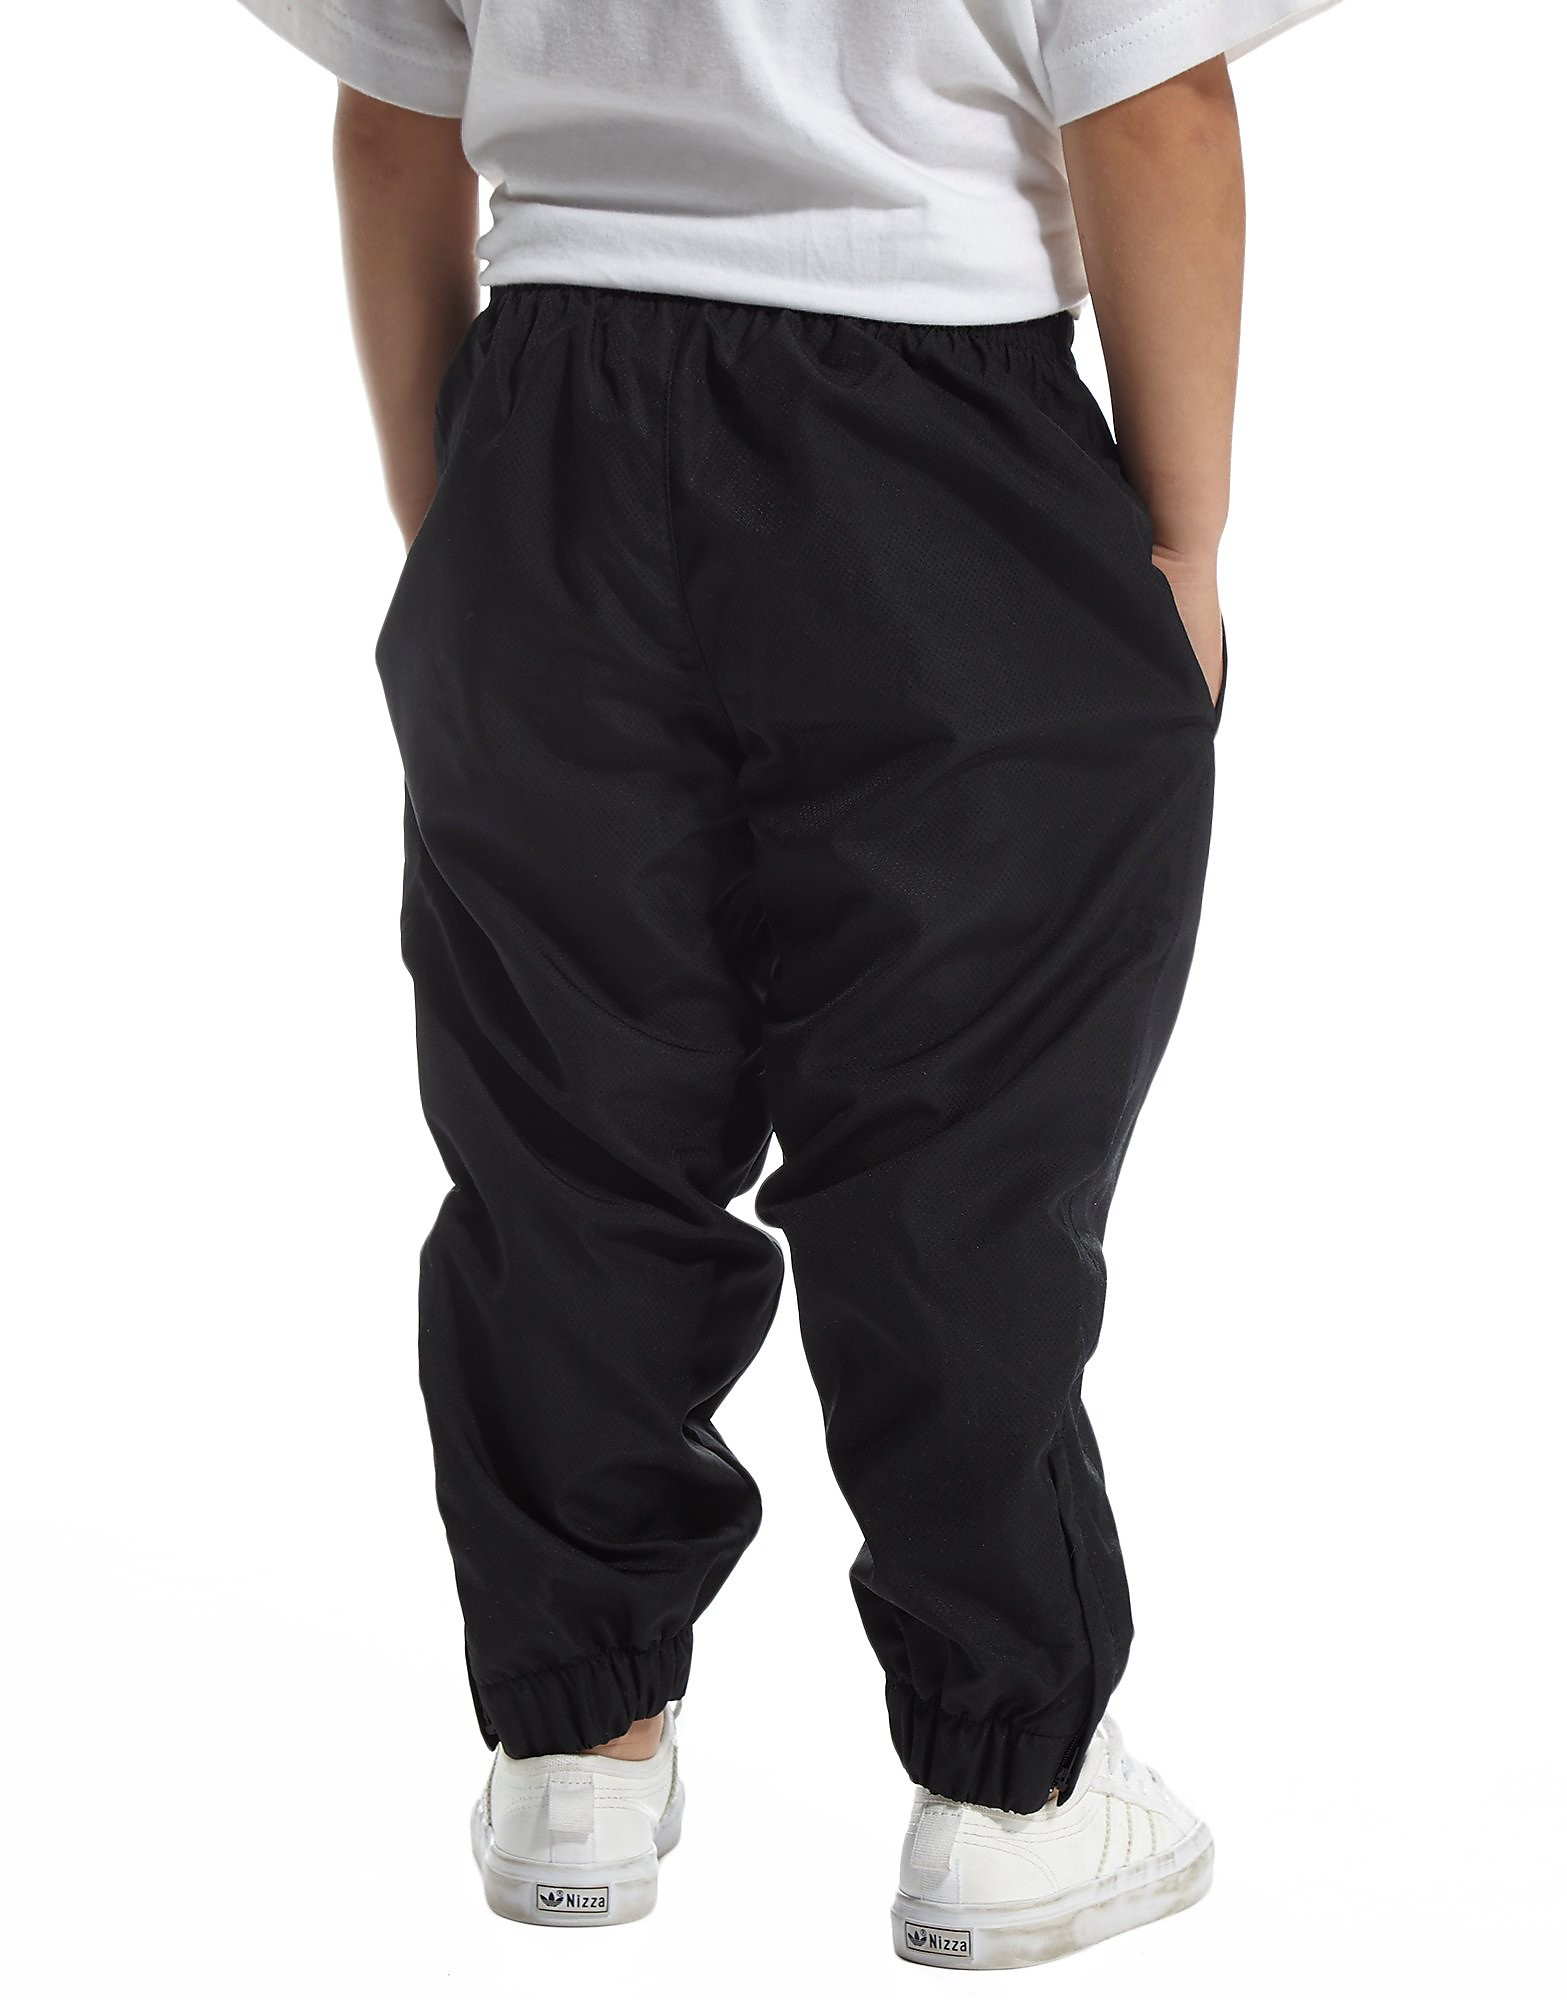 Lacoste Guppy Pants Children